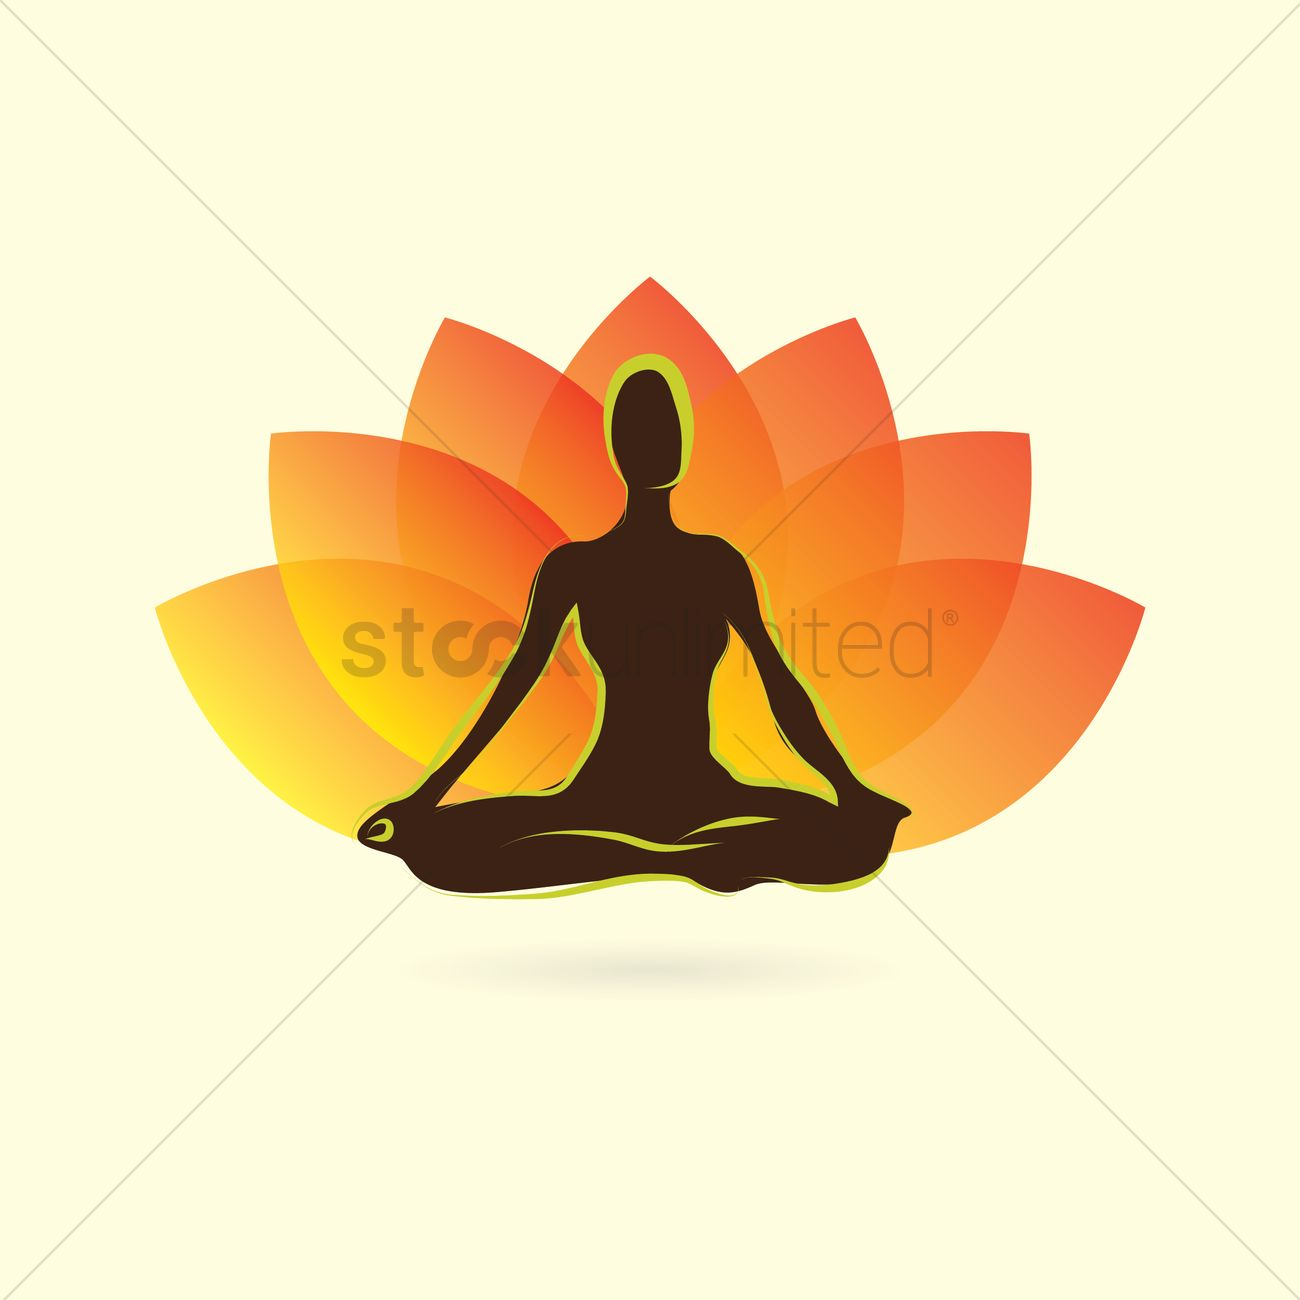 Yoga lotus position clipart vector download Woman silhouette practising yoga in lotus pose Vector Image ... vector download